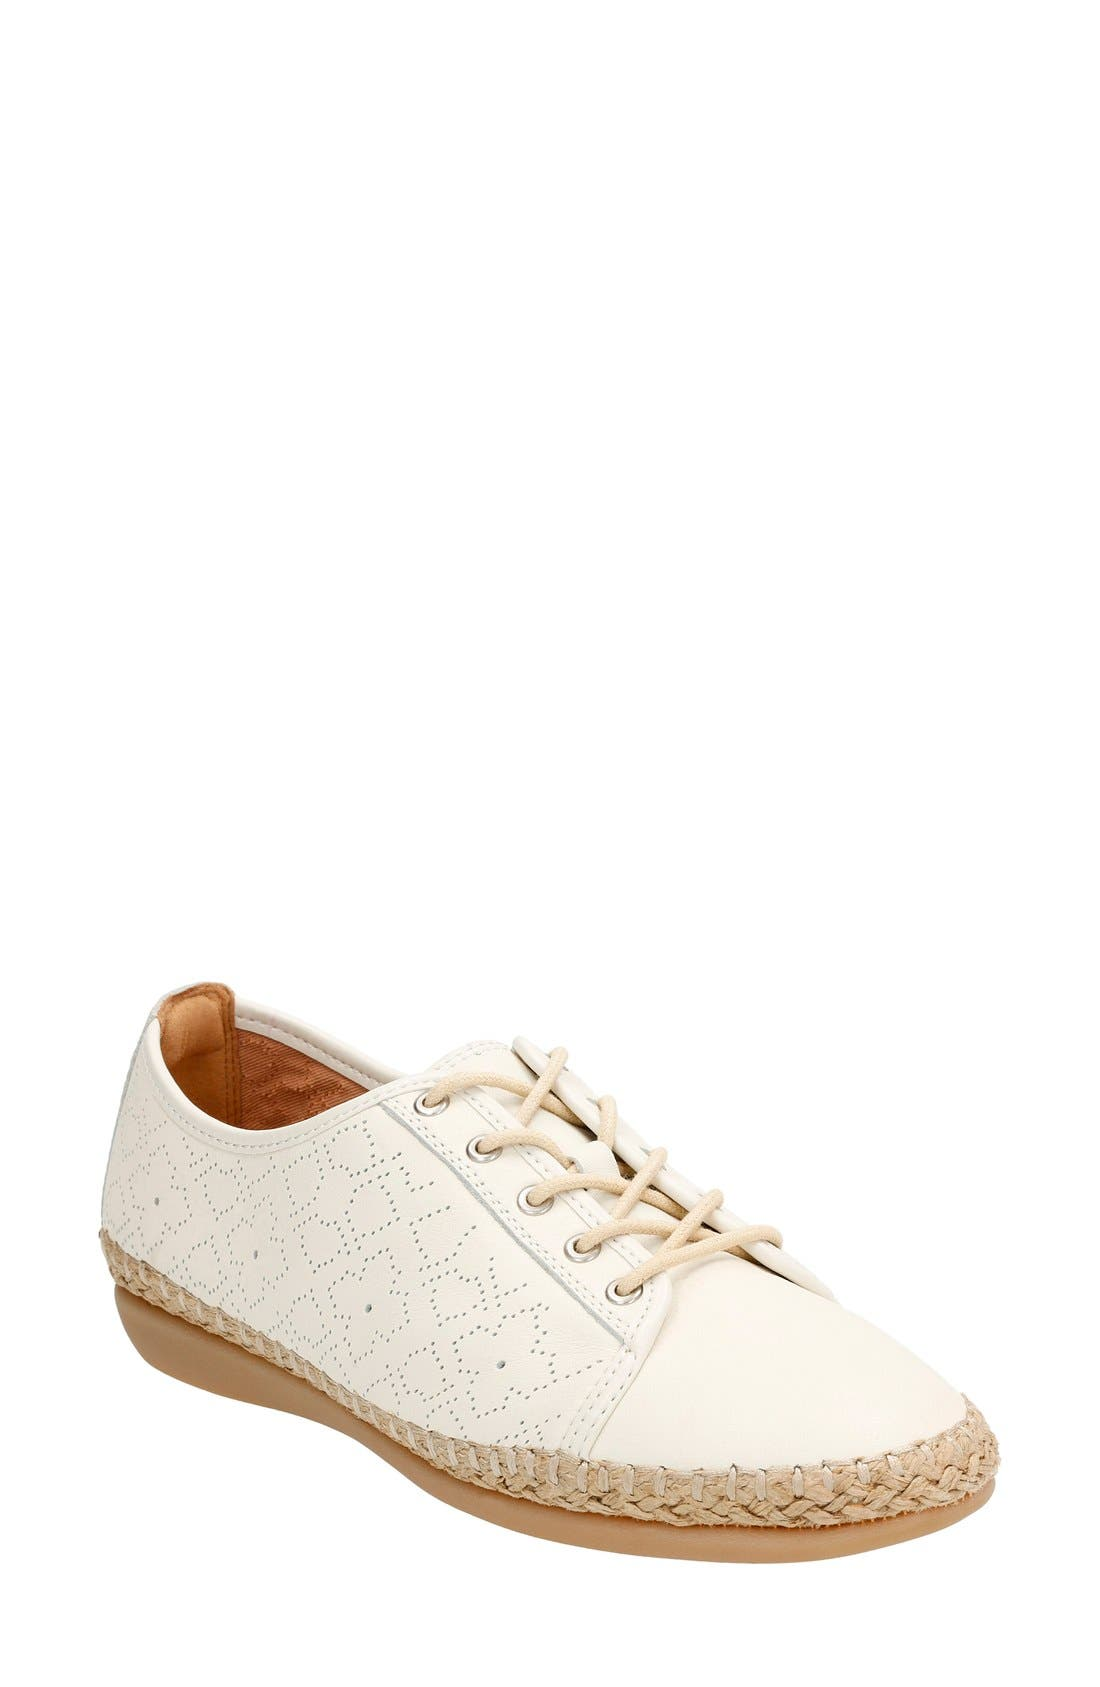 Alternate Image 1 Selected - Clarks® 'Reeney Rita' Sneaker (Women)